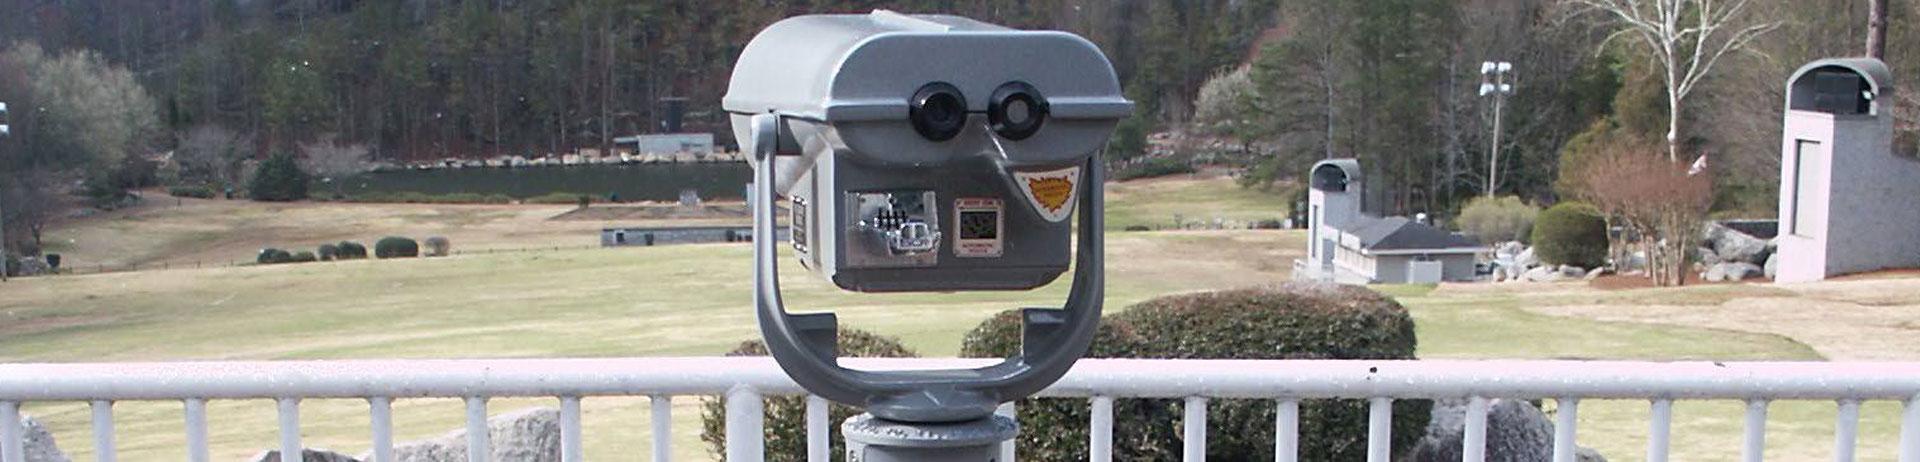 Mark III Binoculars